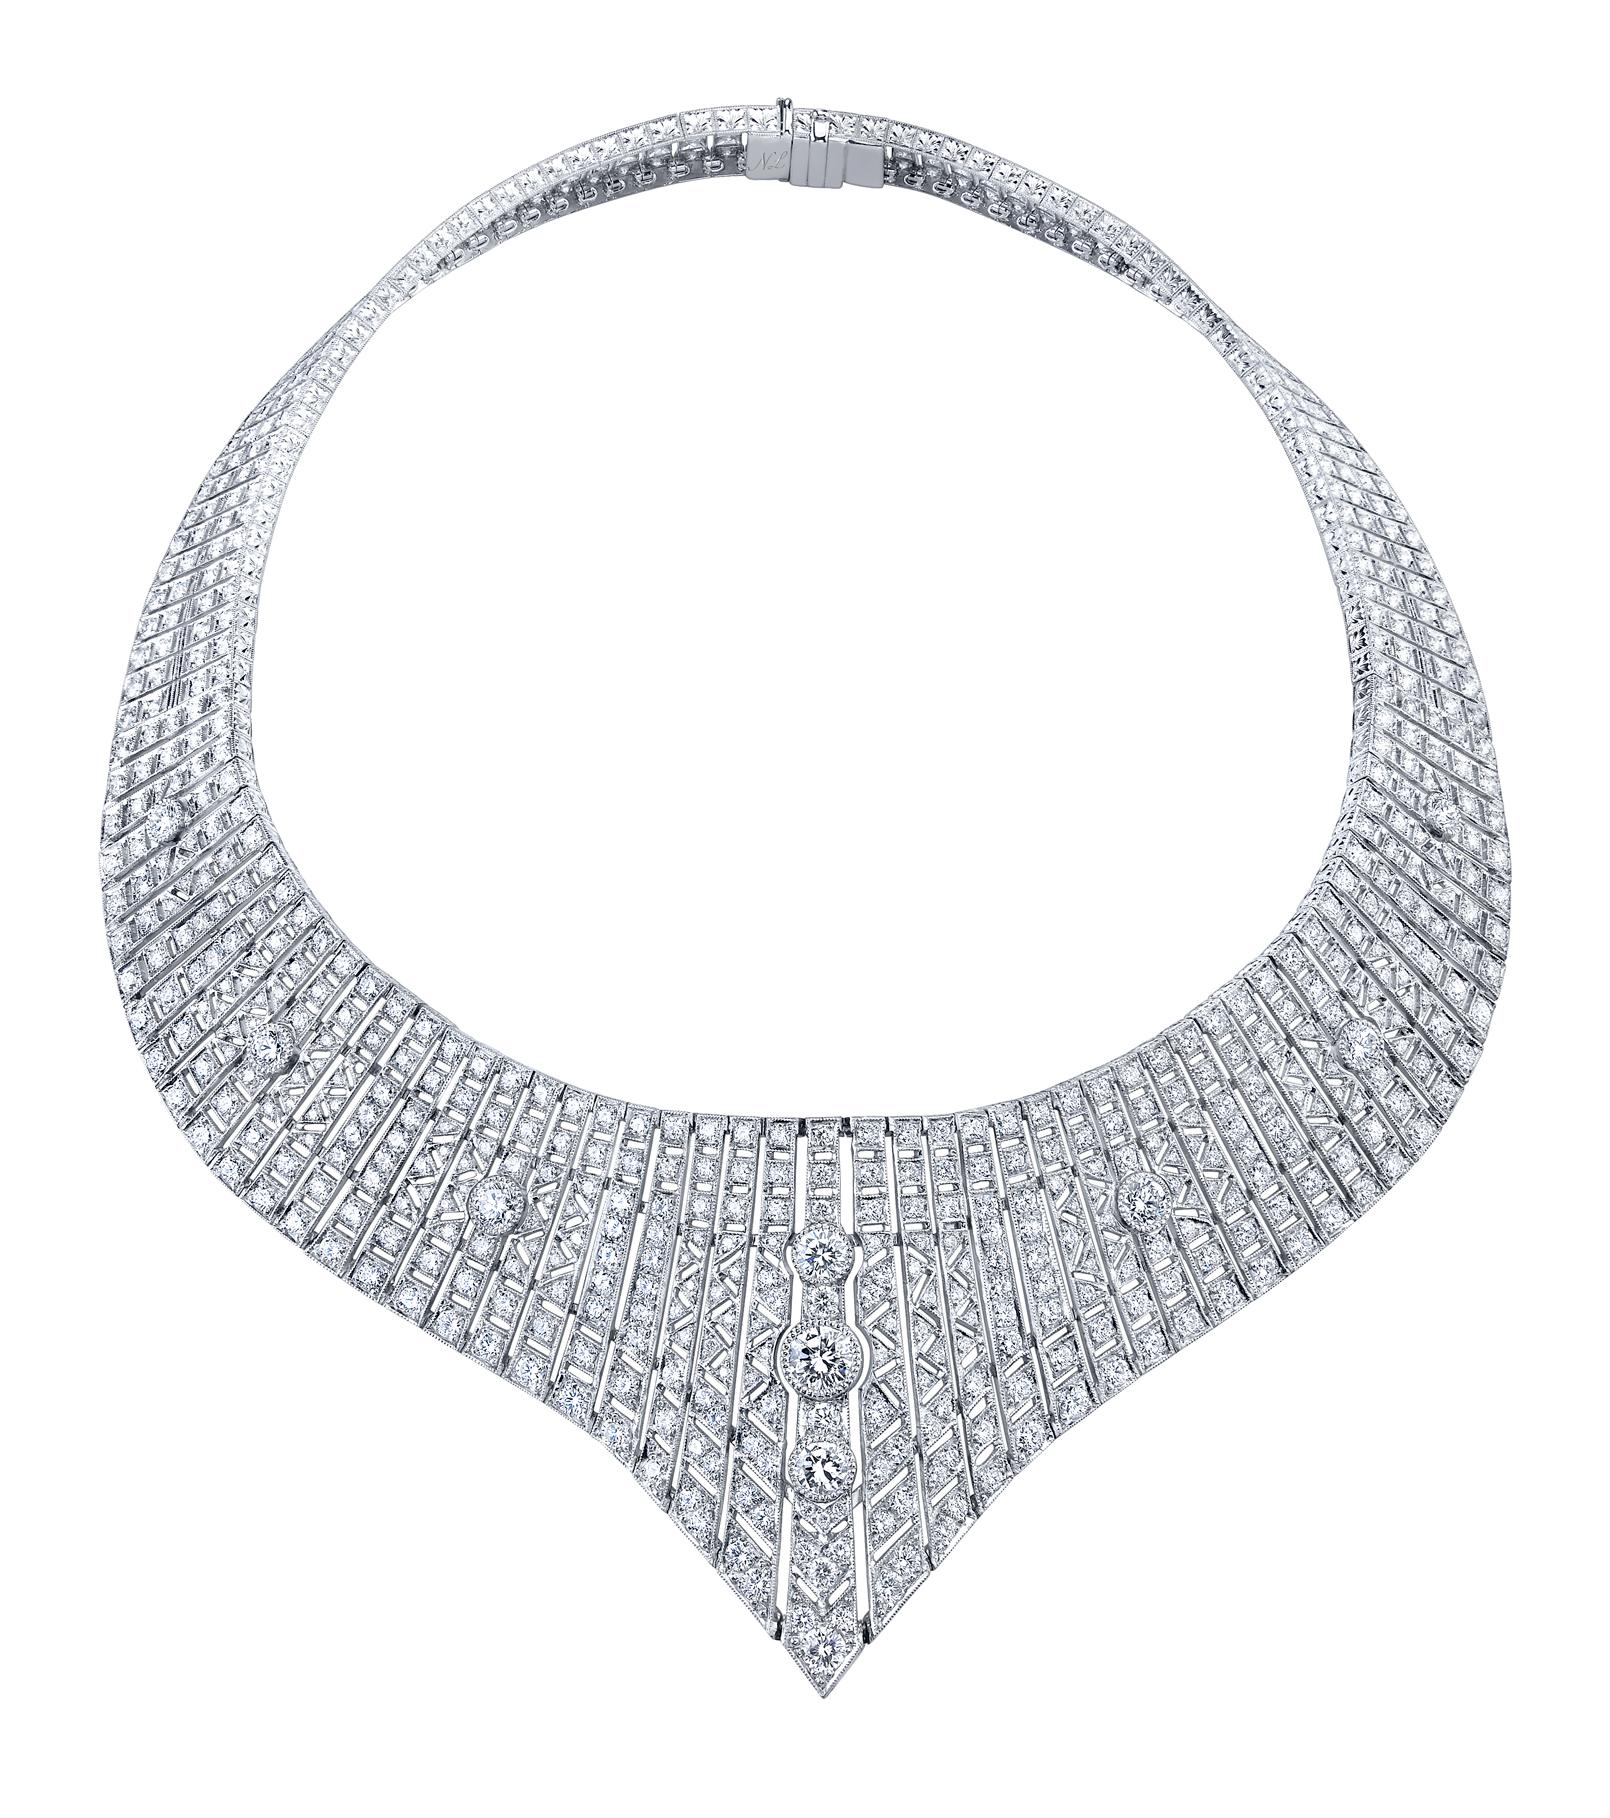 Neil Lane necklace